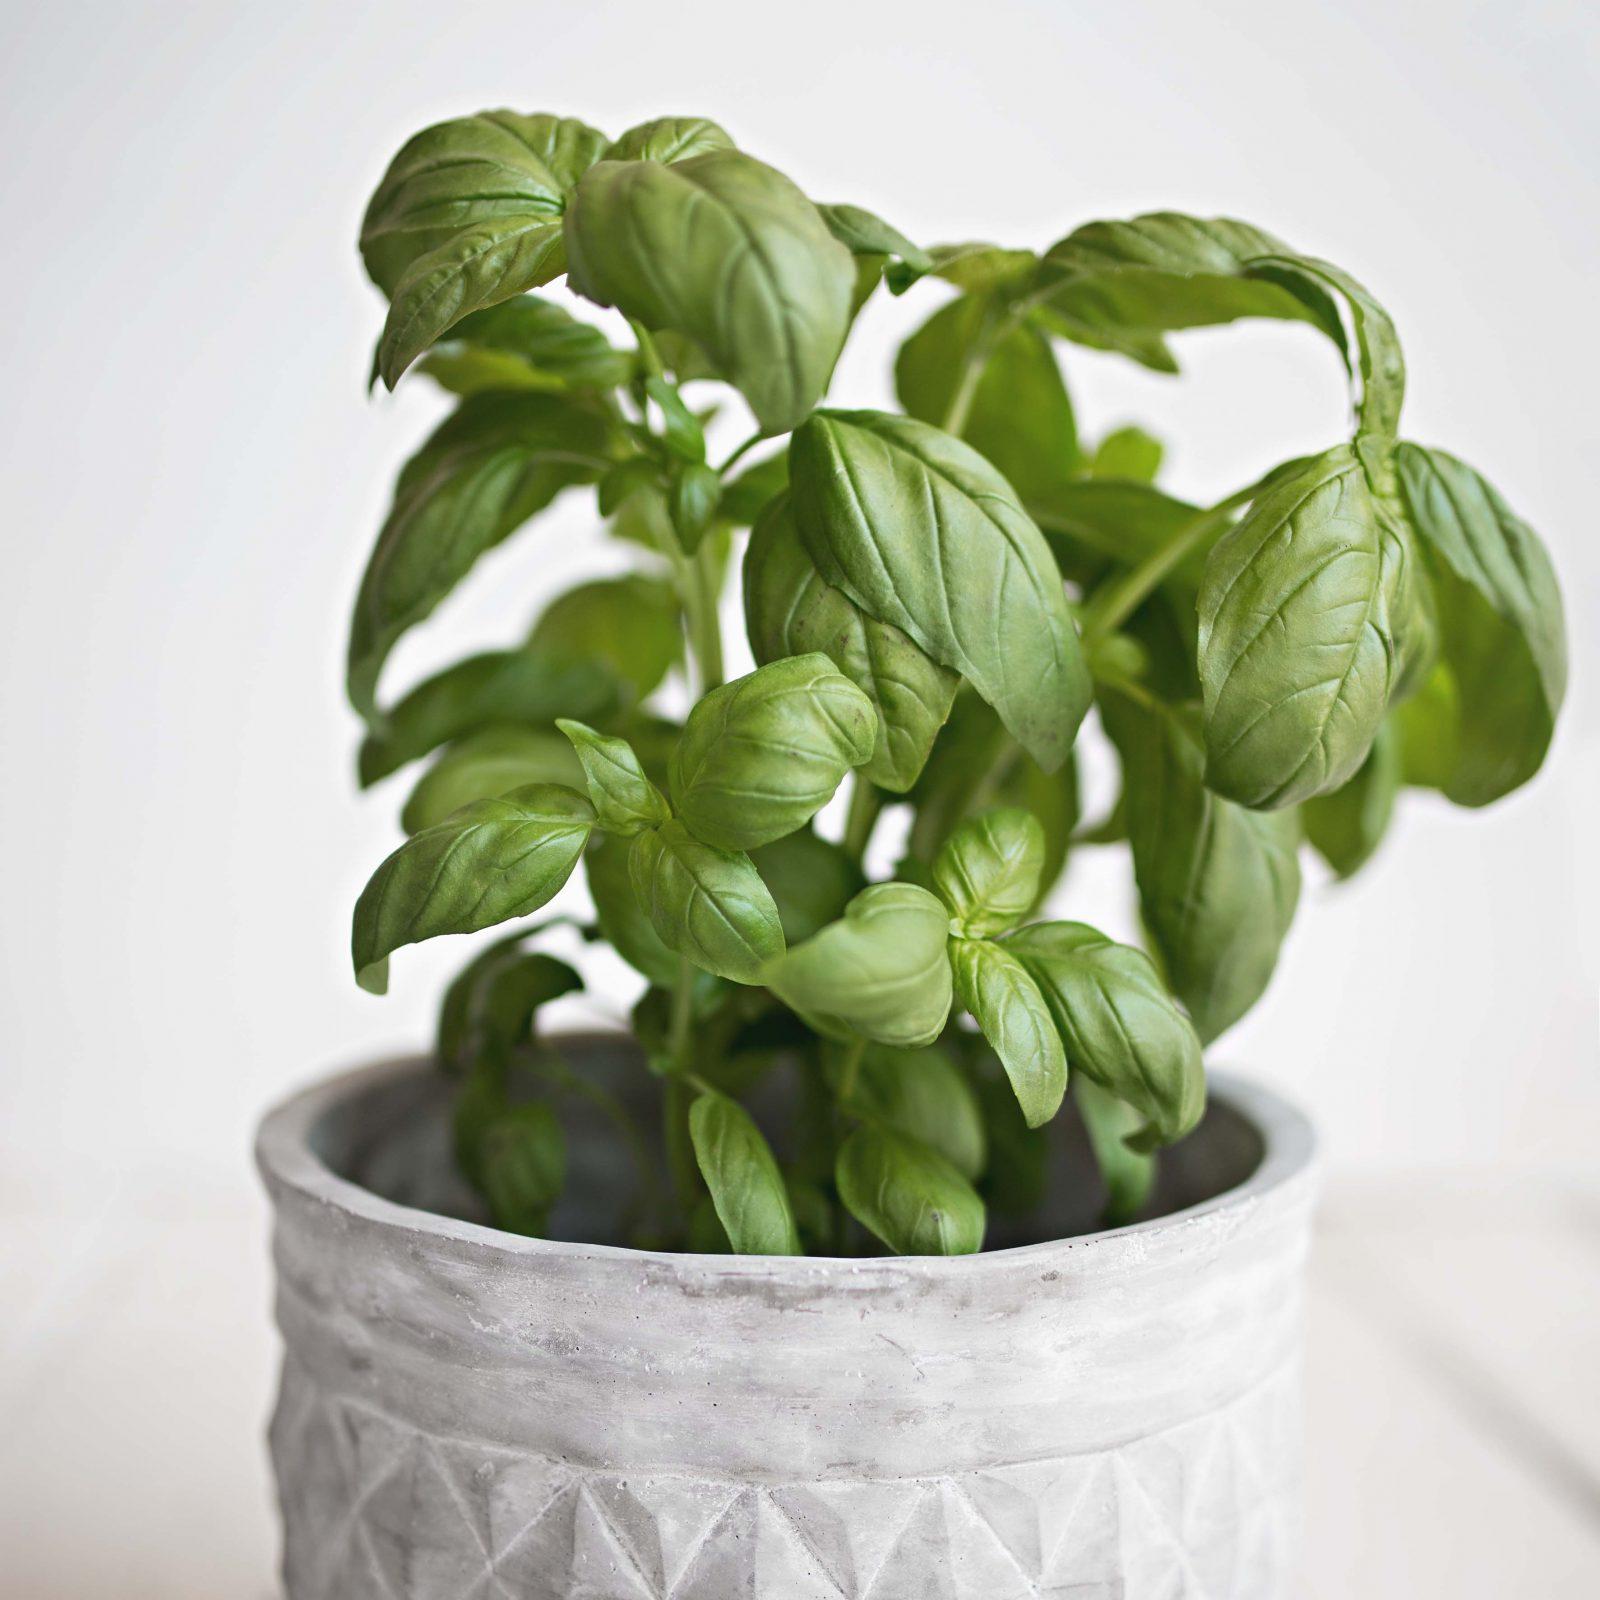 Pot full of basil